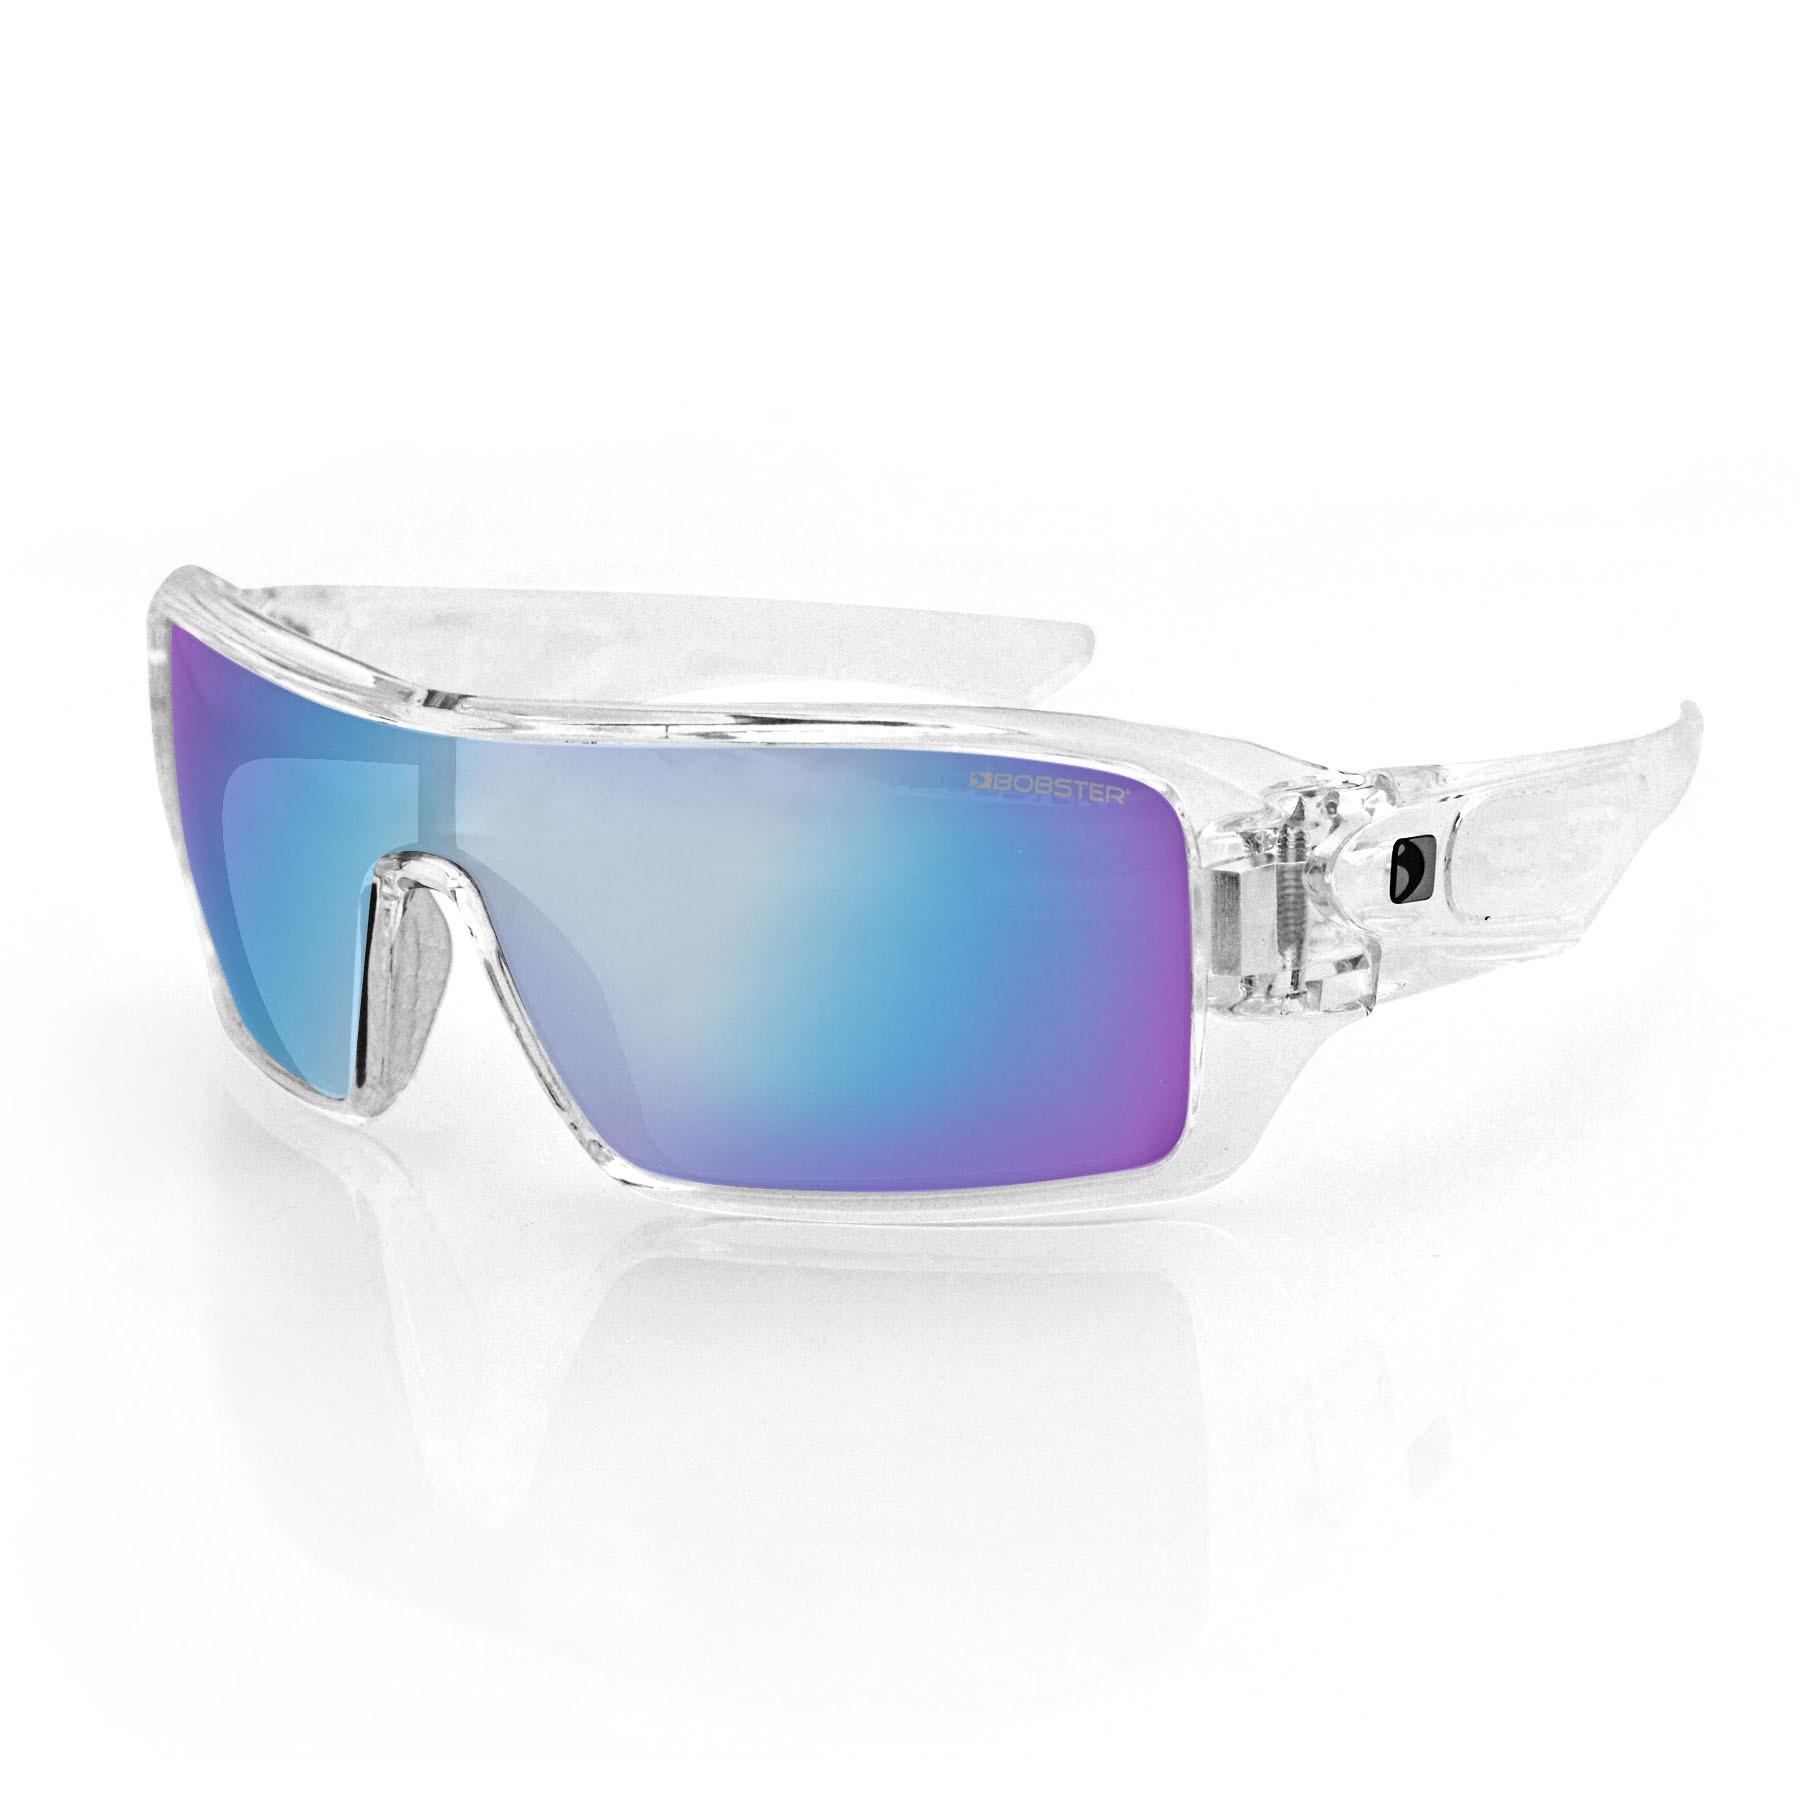 Paragon Sunglasses   Cadre Cycle   Cincinnati\'s Moto Guzzi ...